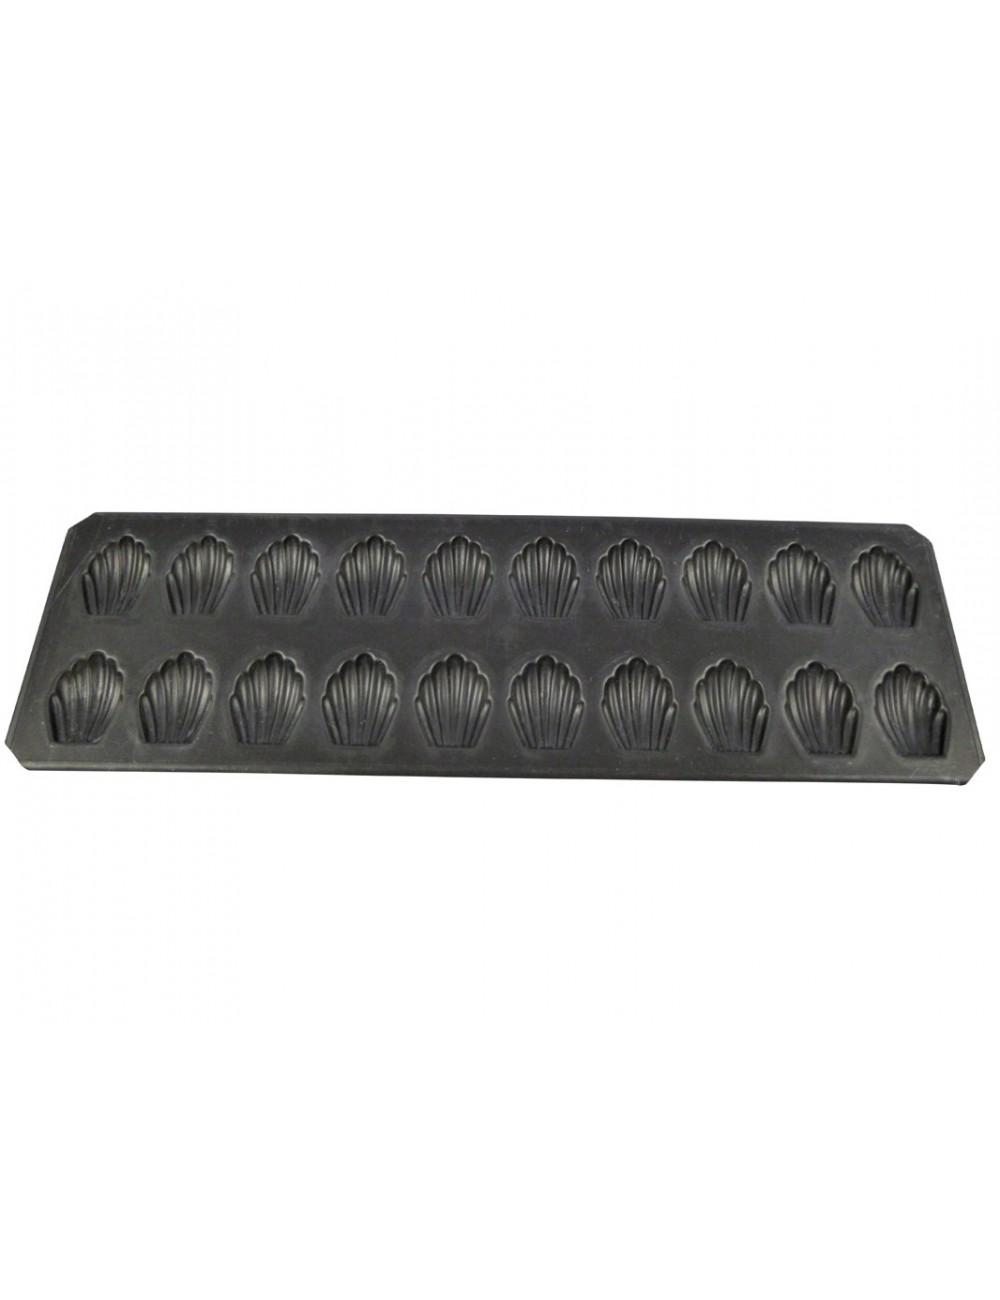 20 MADELEINETTES TIN - EXOPAN - Length 4,2 cm